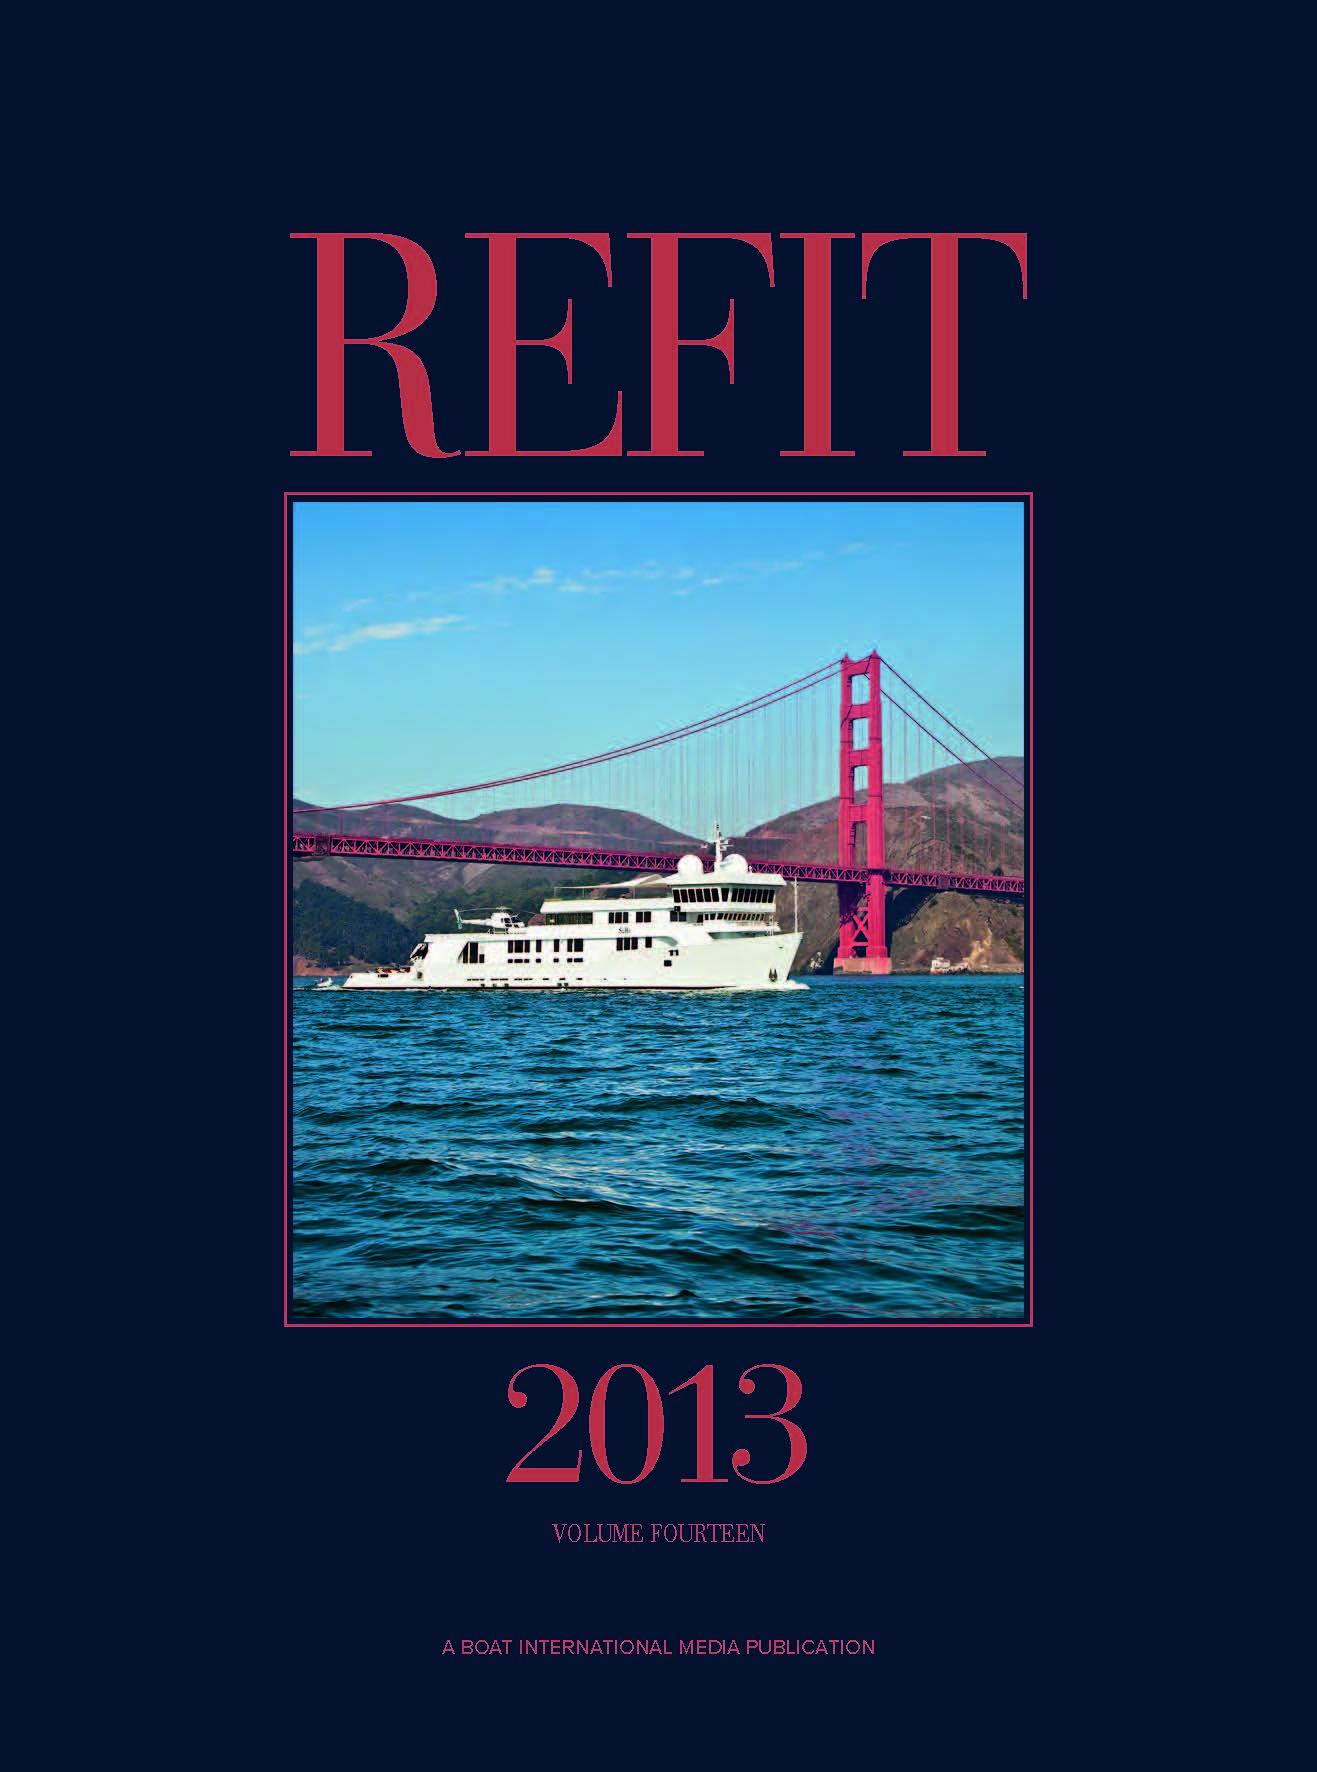 Cover-Refit-2013-web_©Jim-Raycroft.jpg